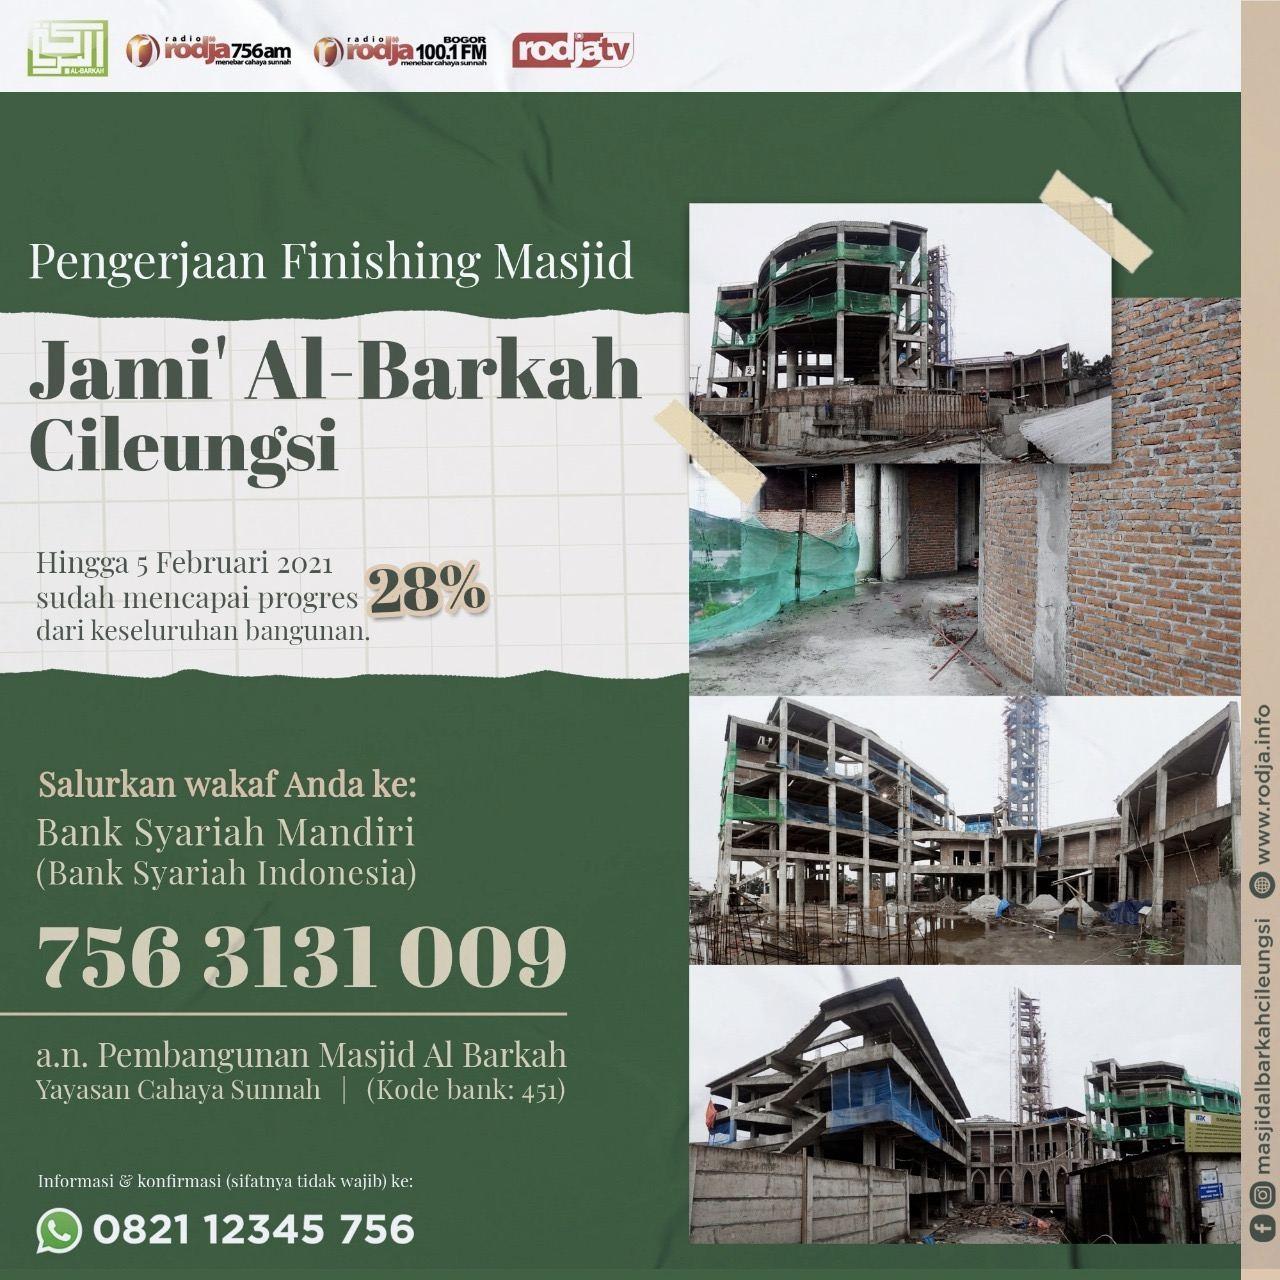 Pembangunan Masjid